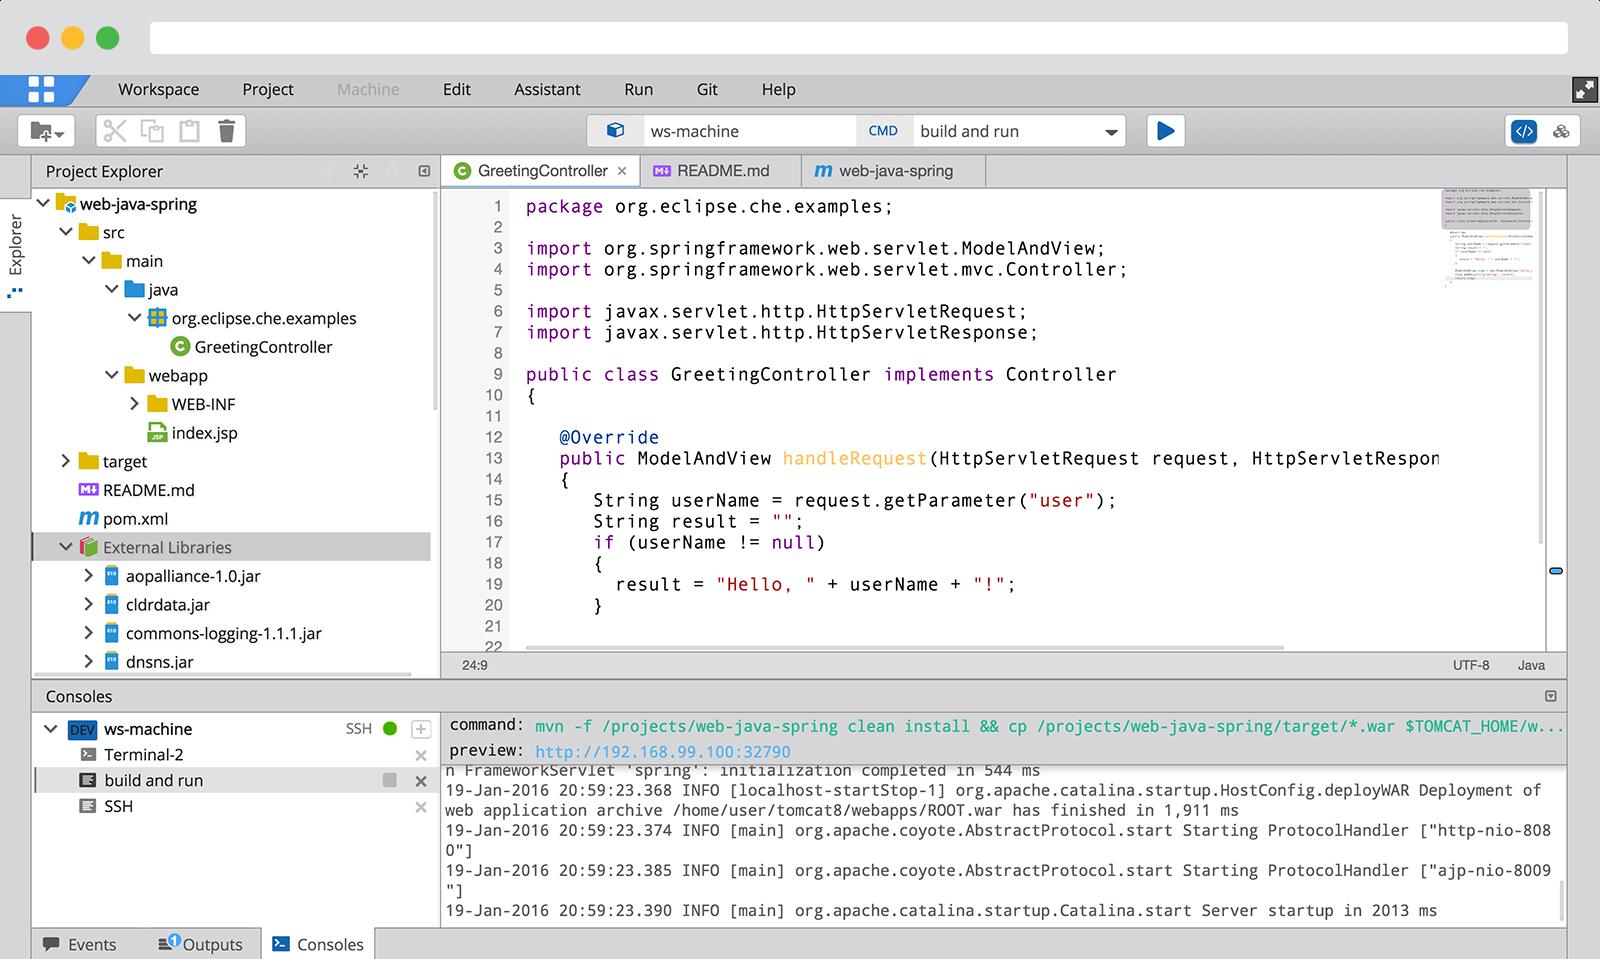 Codenvy Software - Work offline